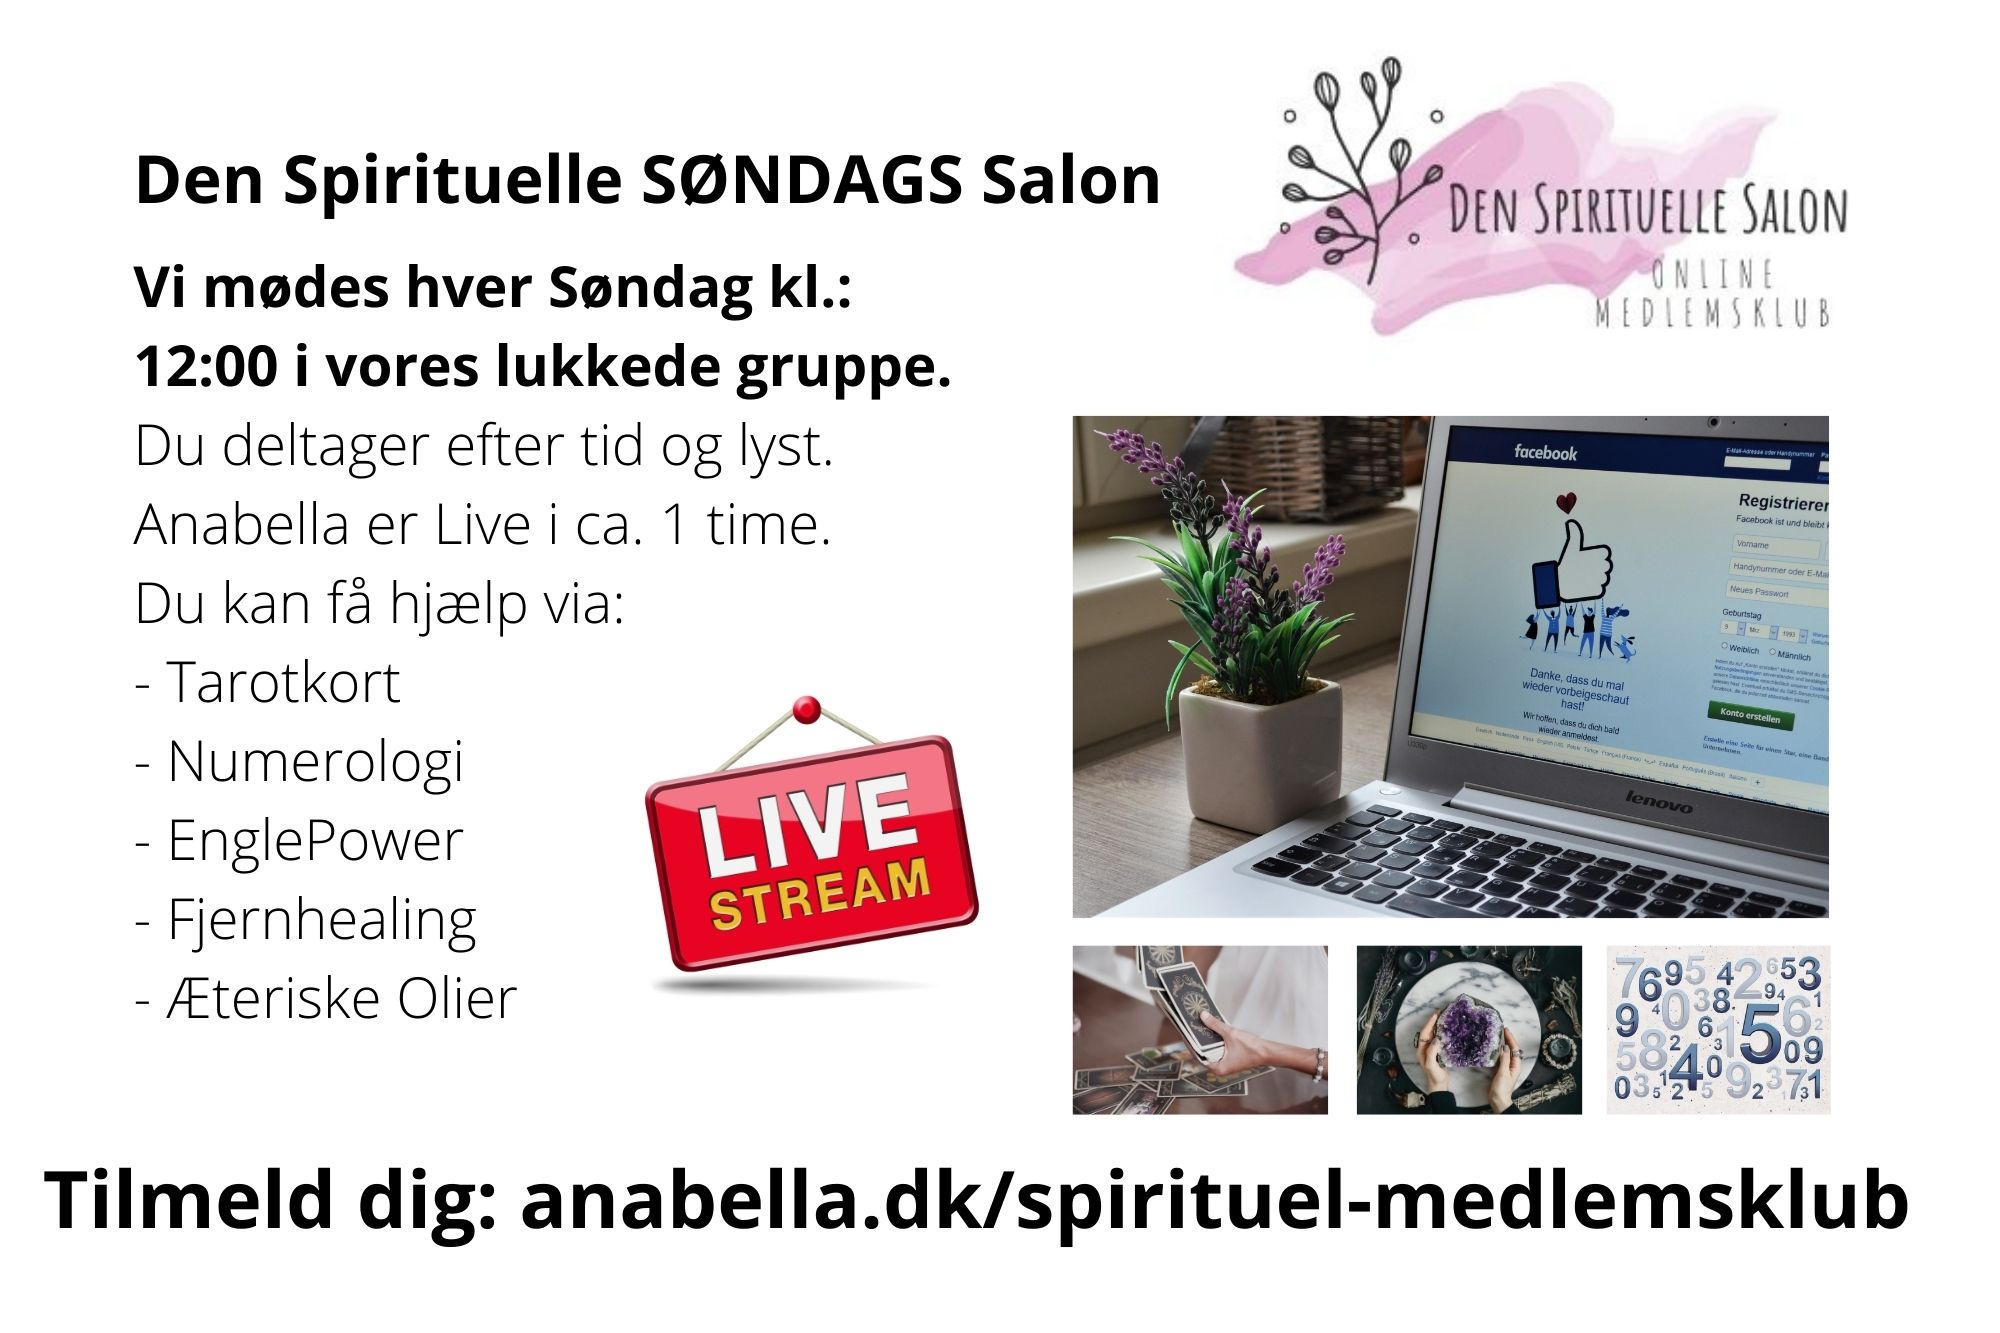 Den Spirituelle Salon LIVE